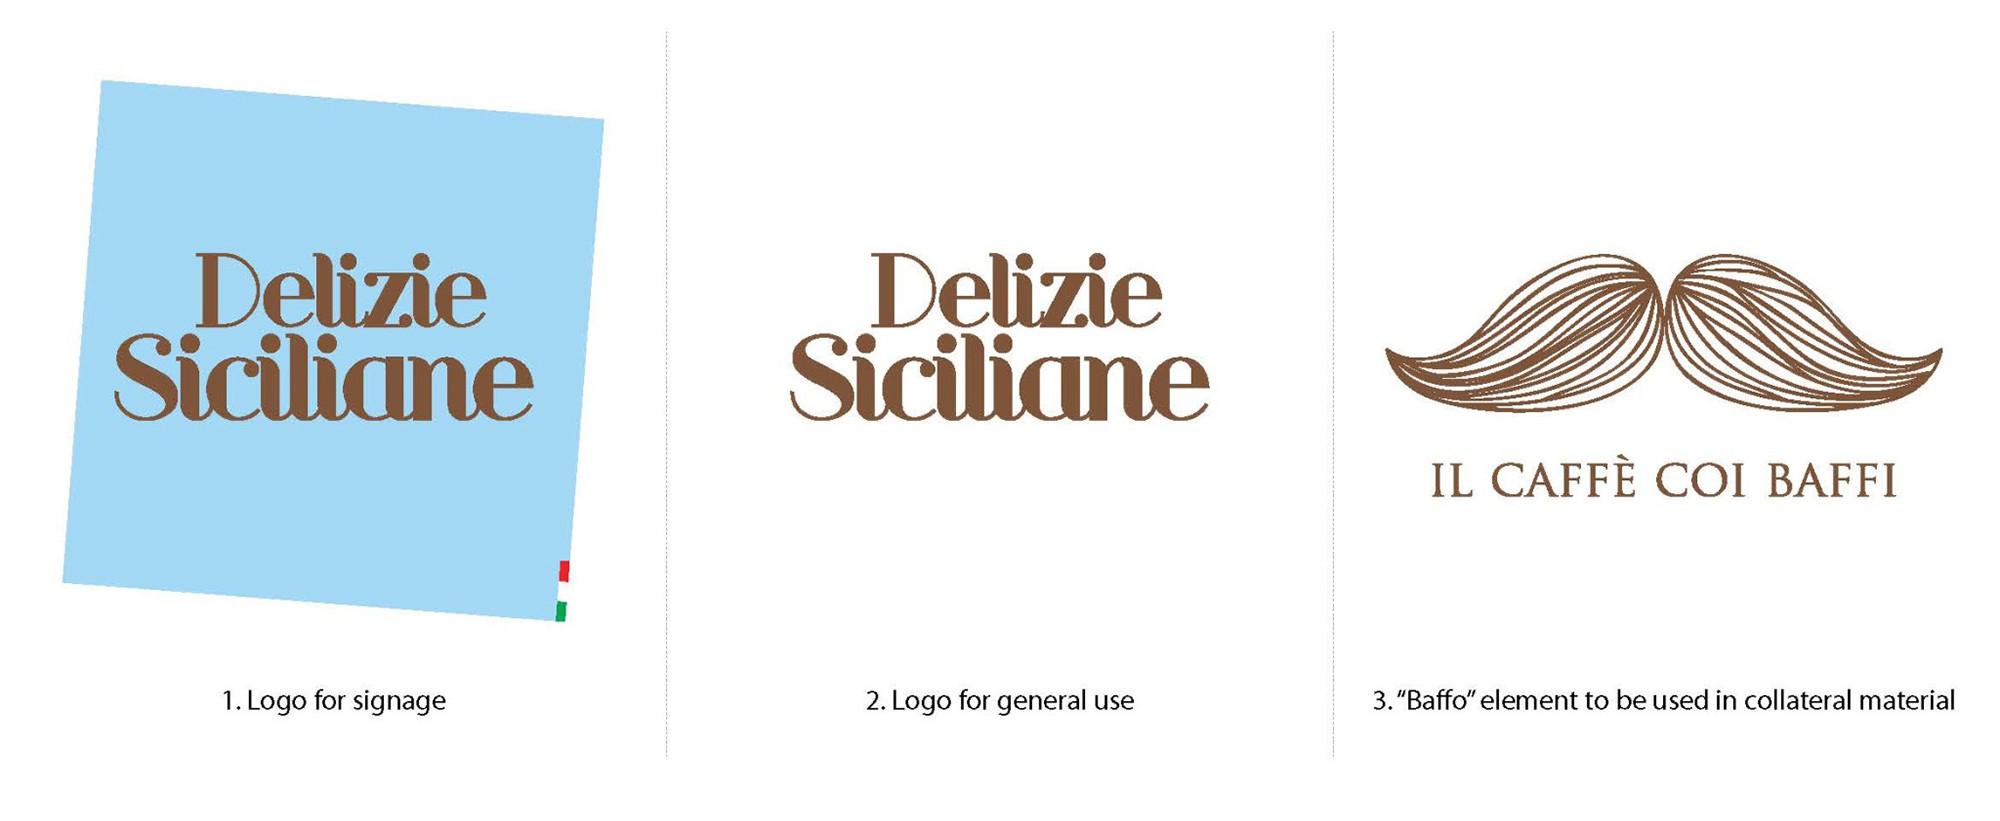 delizie-siciliane-logo-finals-1-copia-copia